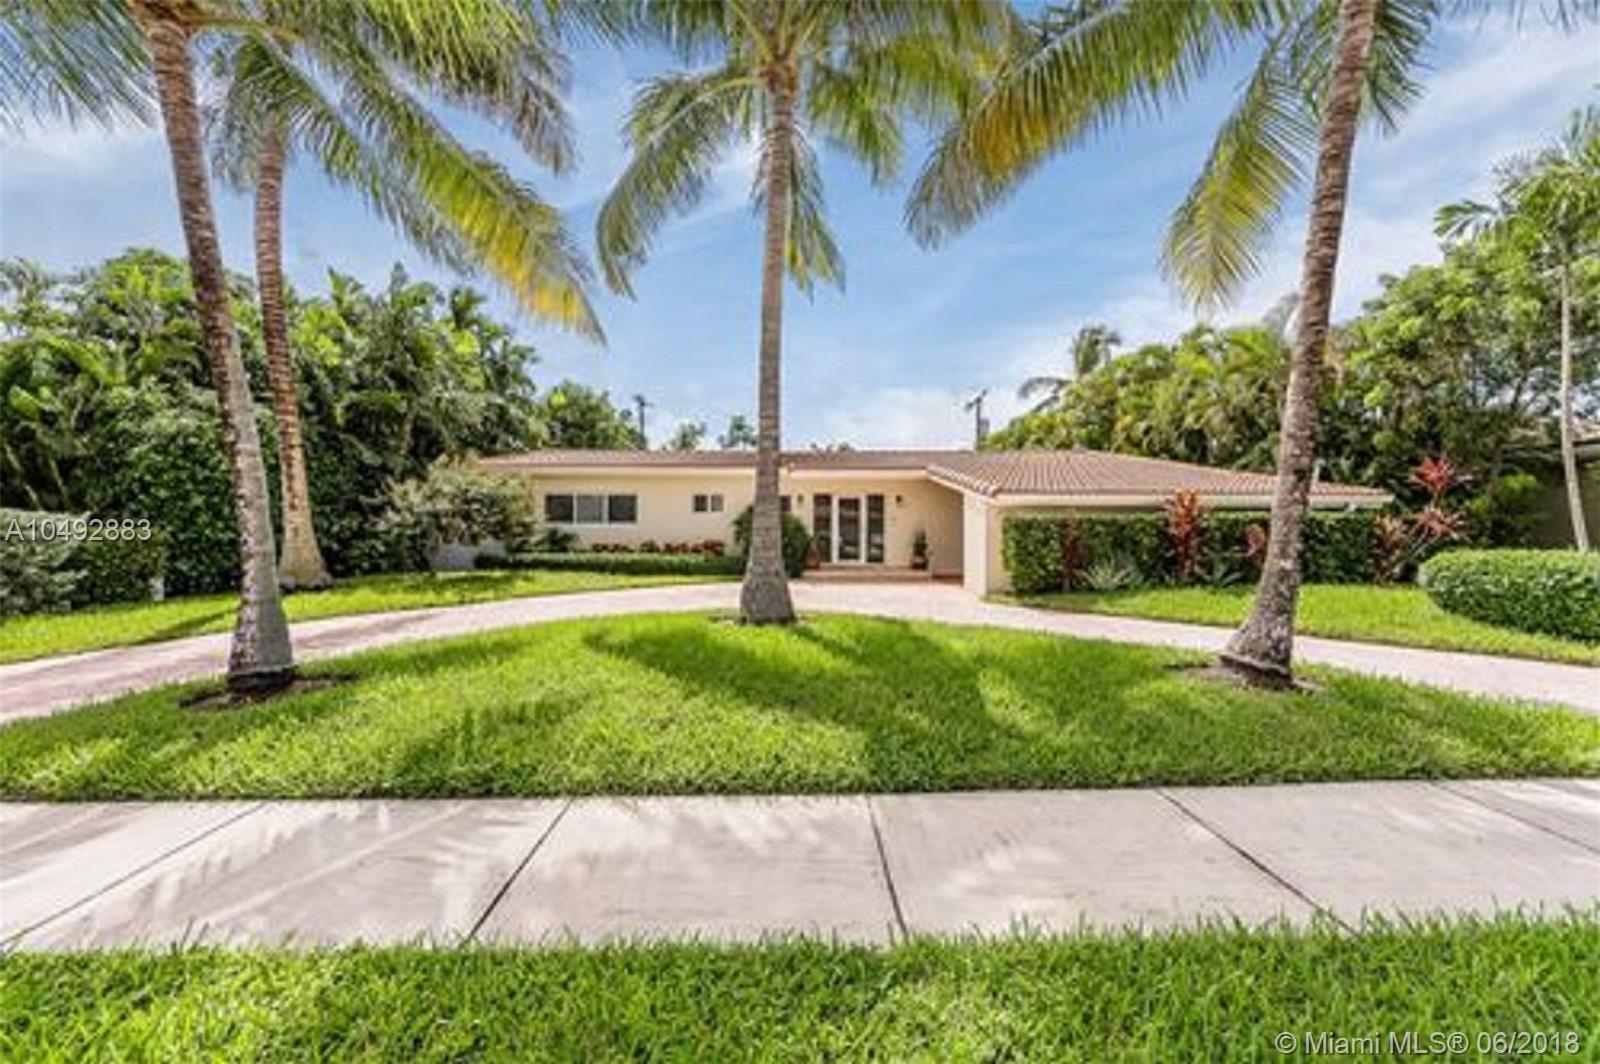 2280 Keystone Blvd, North Miami, FL 33181